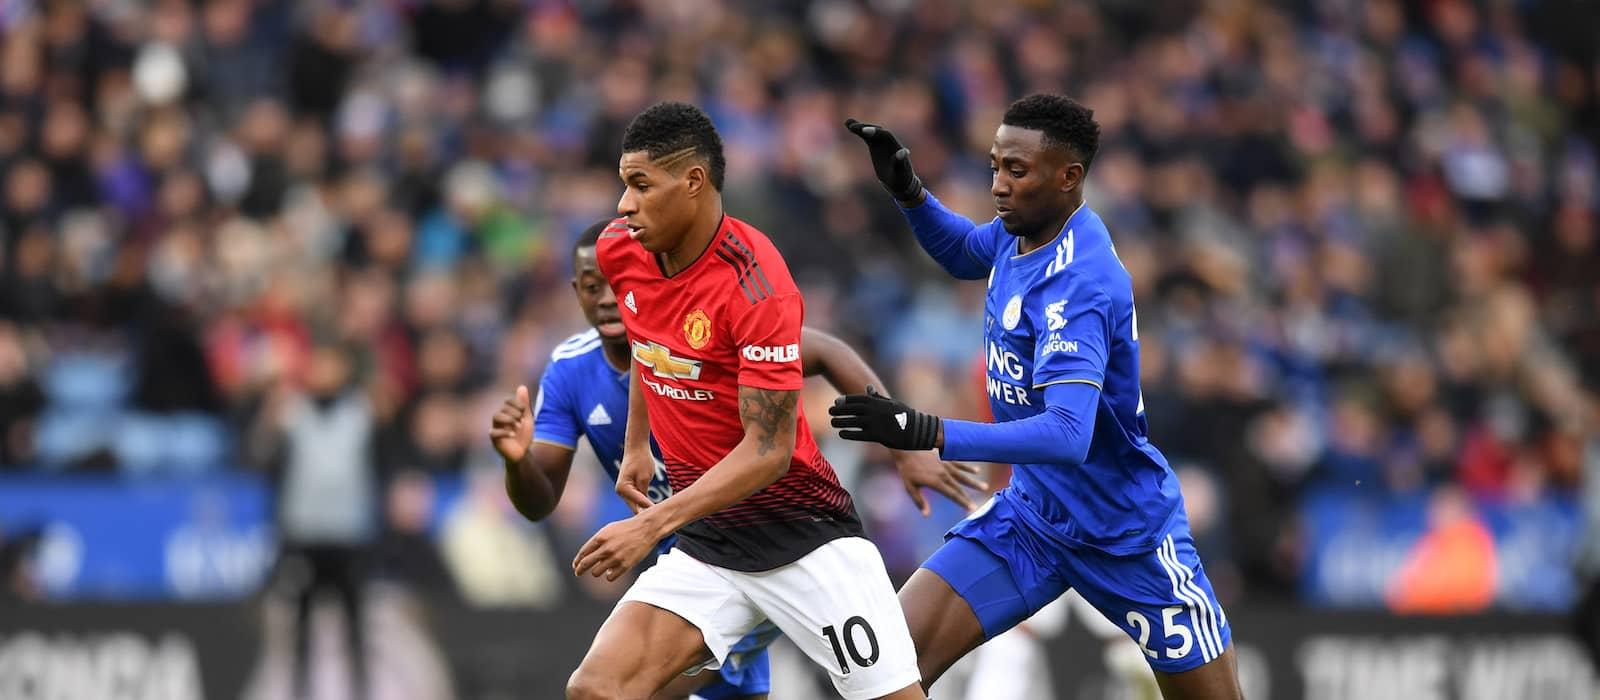 Manchester United fans enjoying telepathic Paul Pogba and Marcus Rashford vs Leicester